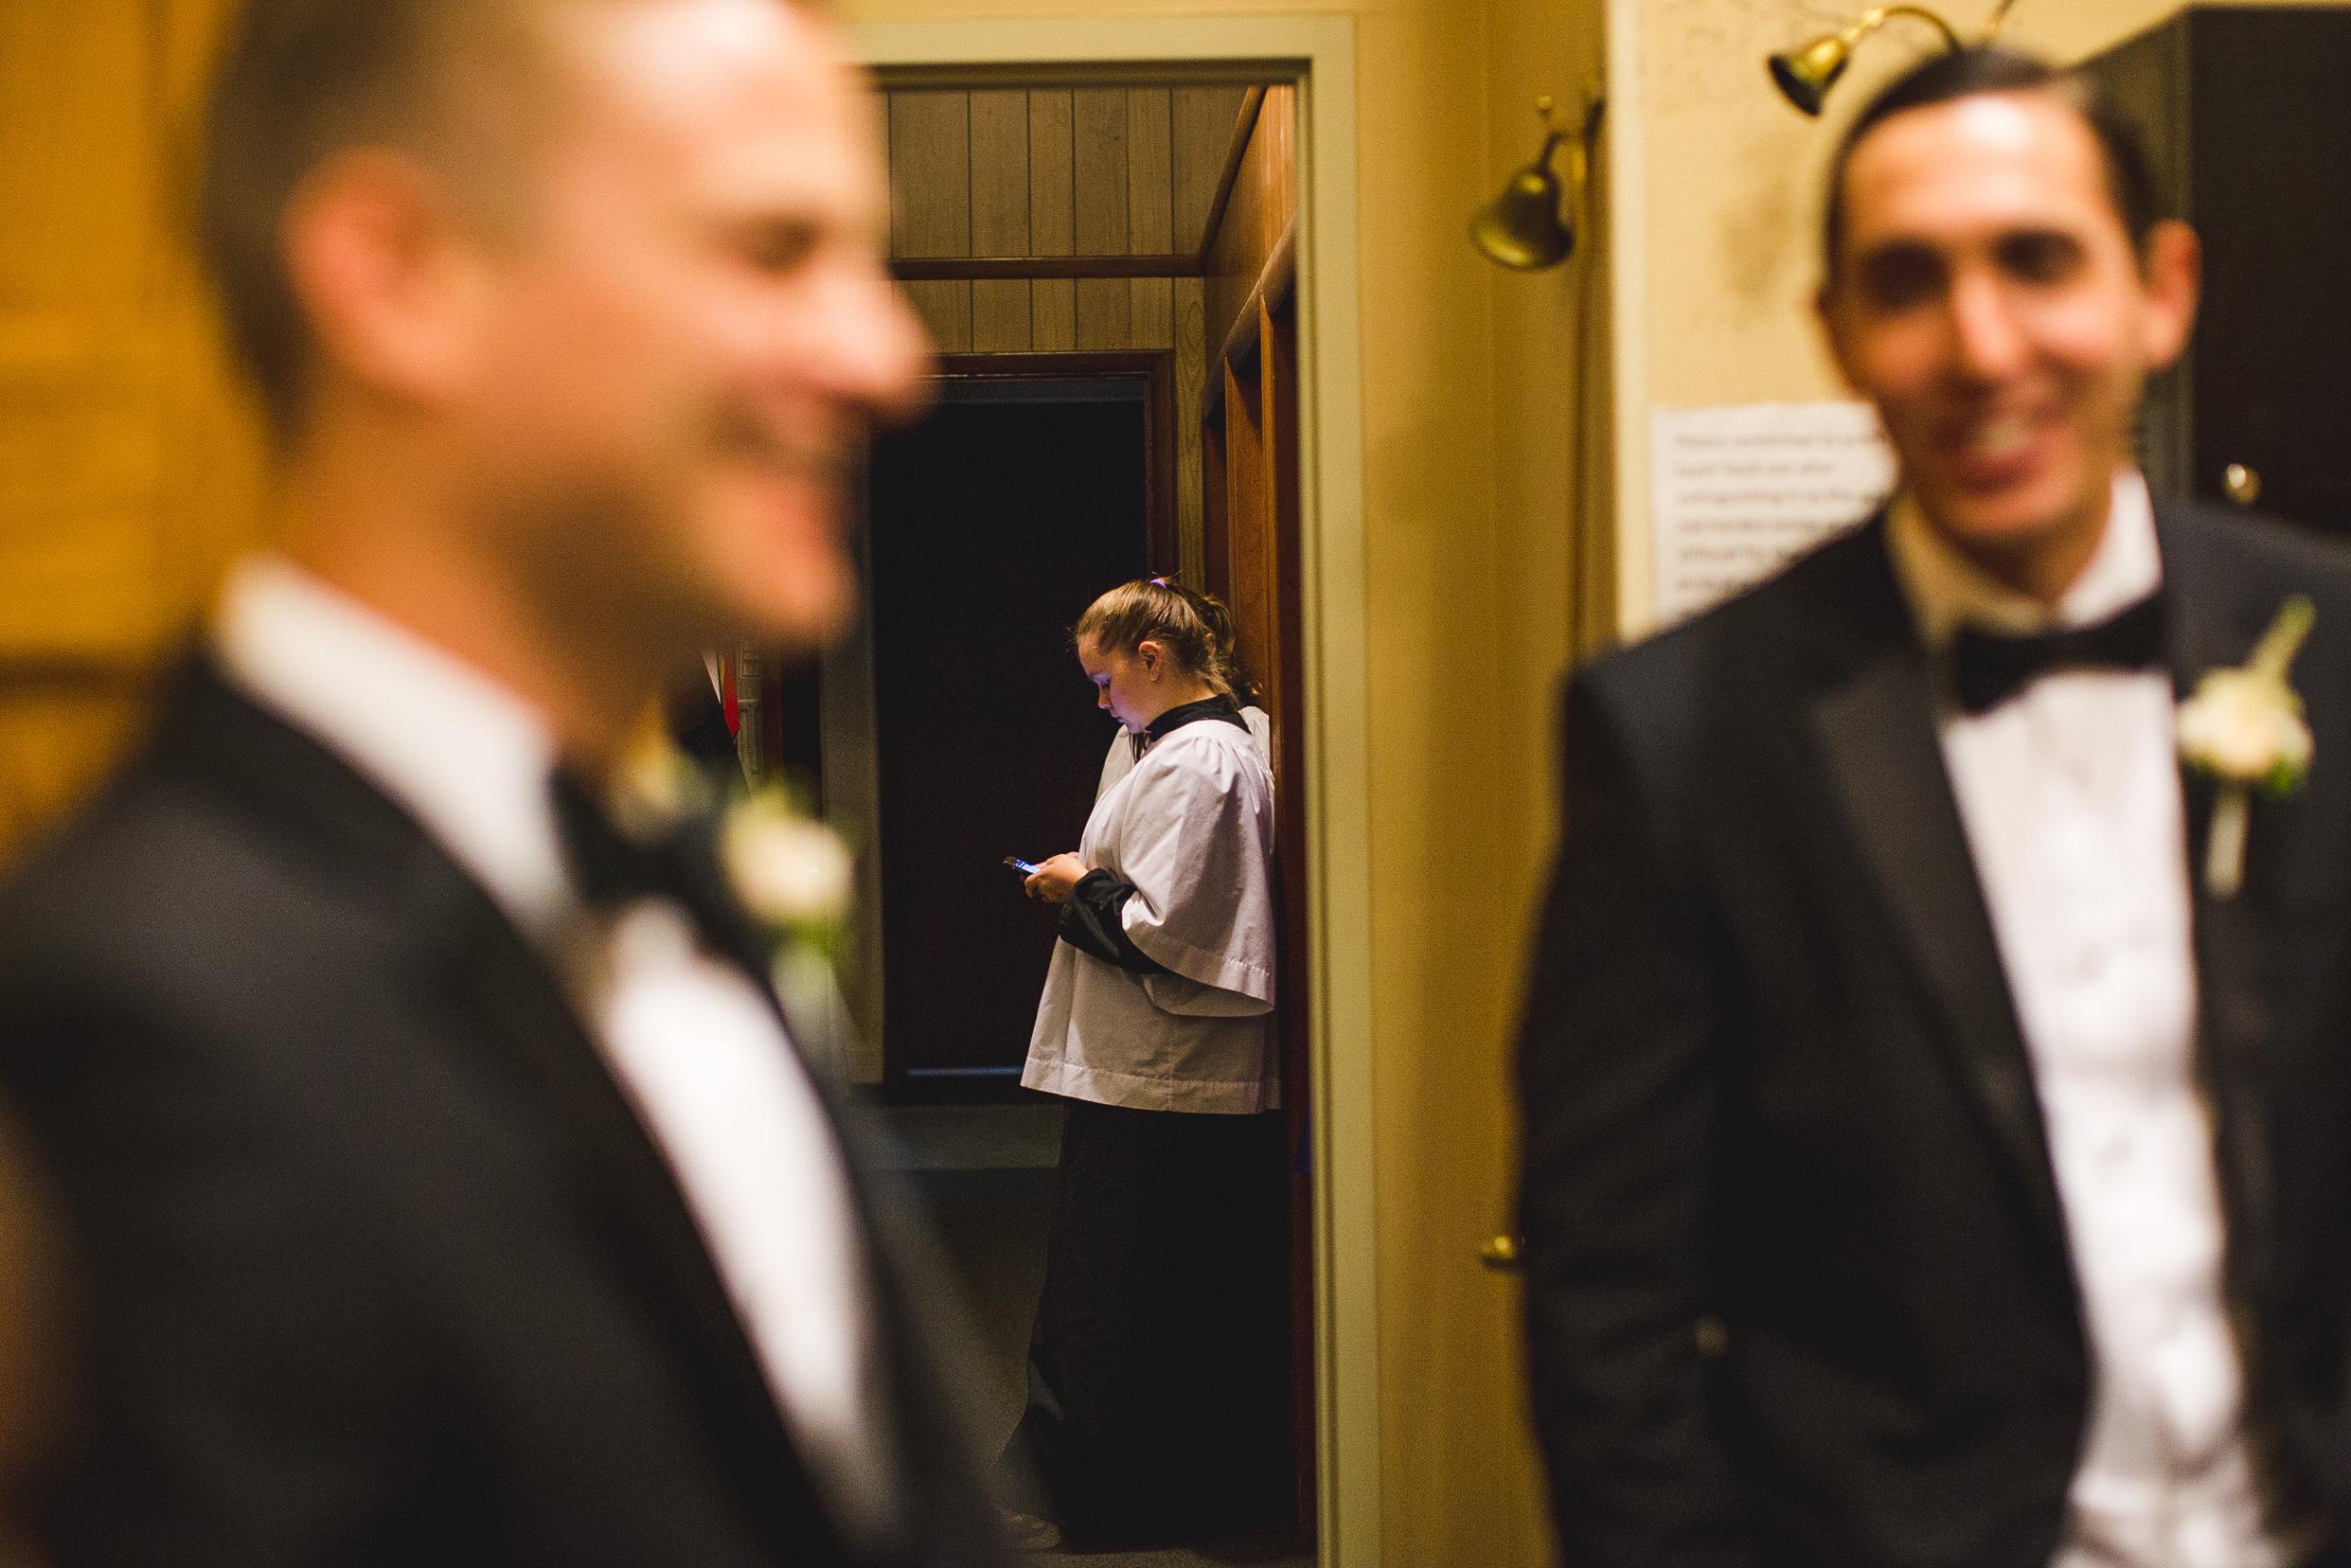 Wedding at Woodlawn Manor Sandy Spring Maryland by Mantas Kubilinskas-9.jpg